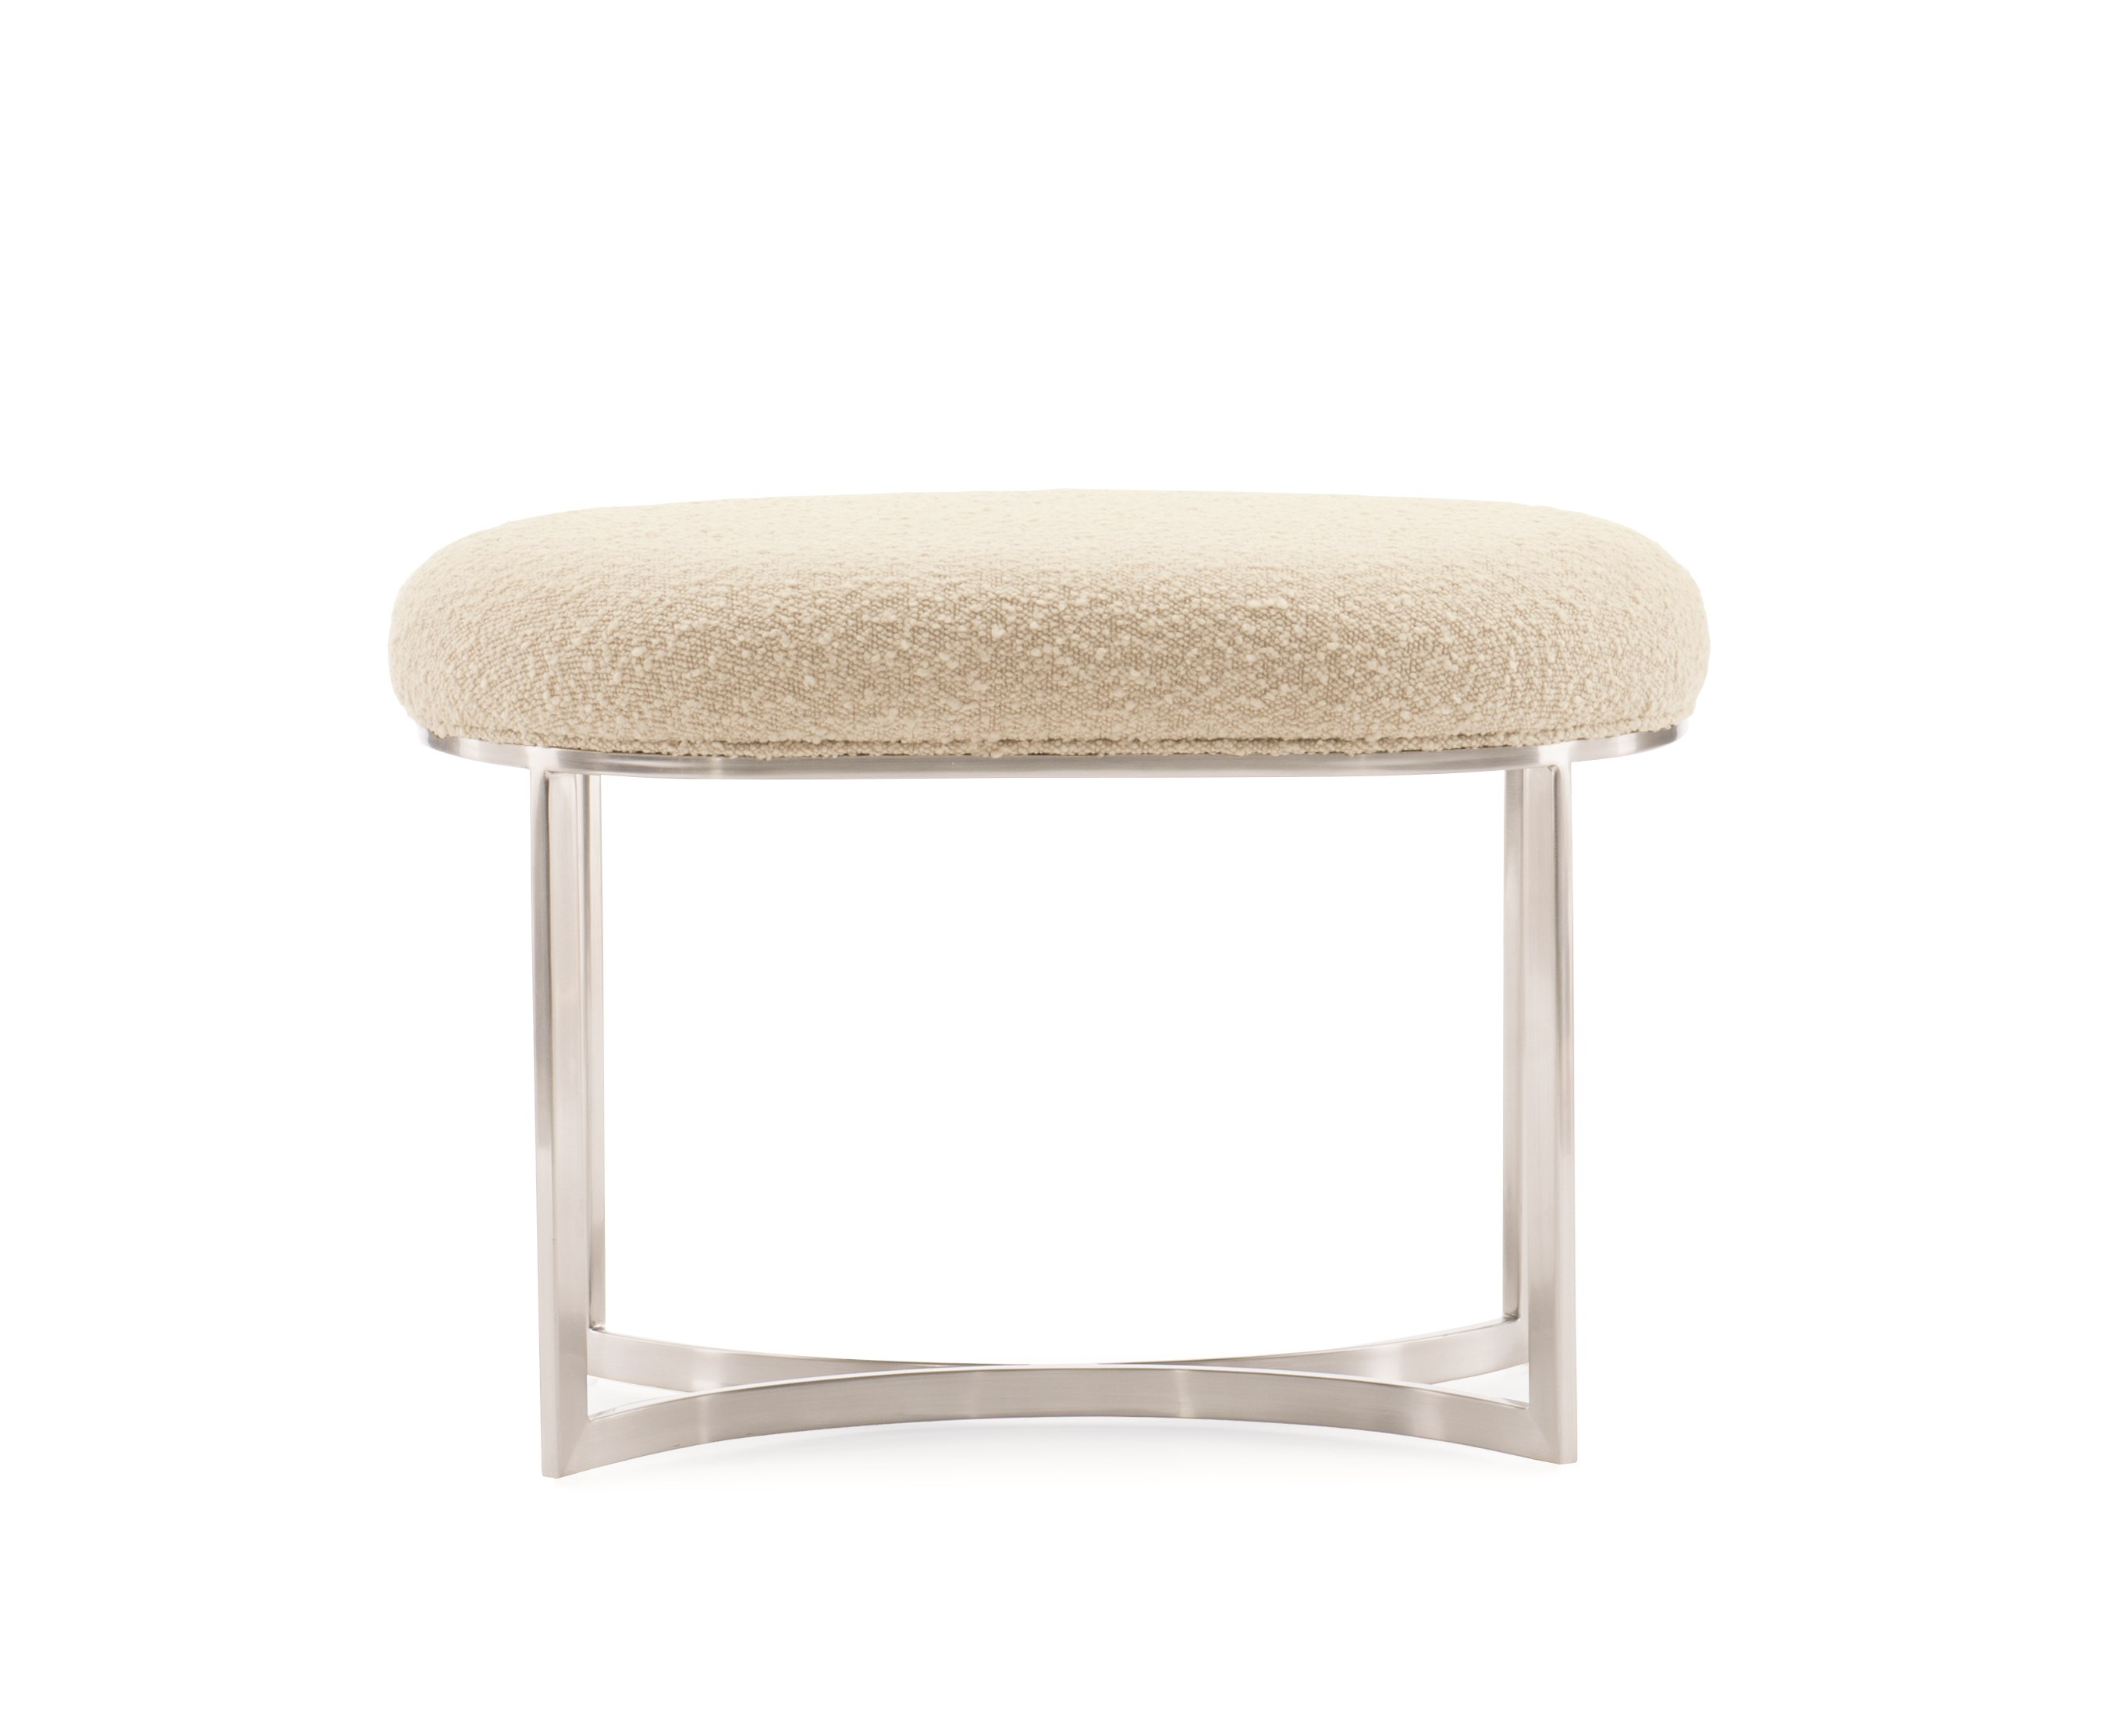 Strange Grace Bed Bench Caracole Inzonedesignstudio Interior Chair Design Inzonedesignstudiocom